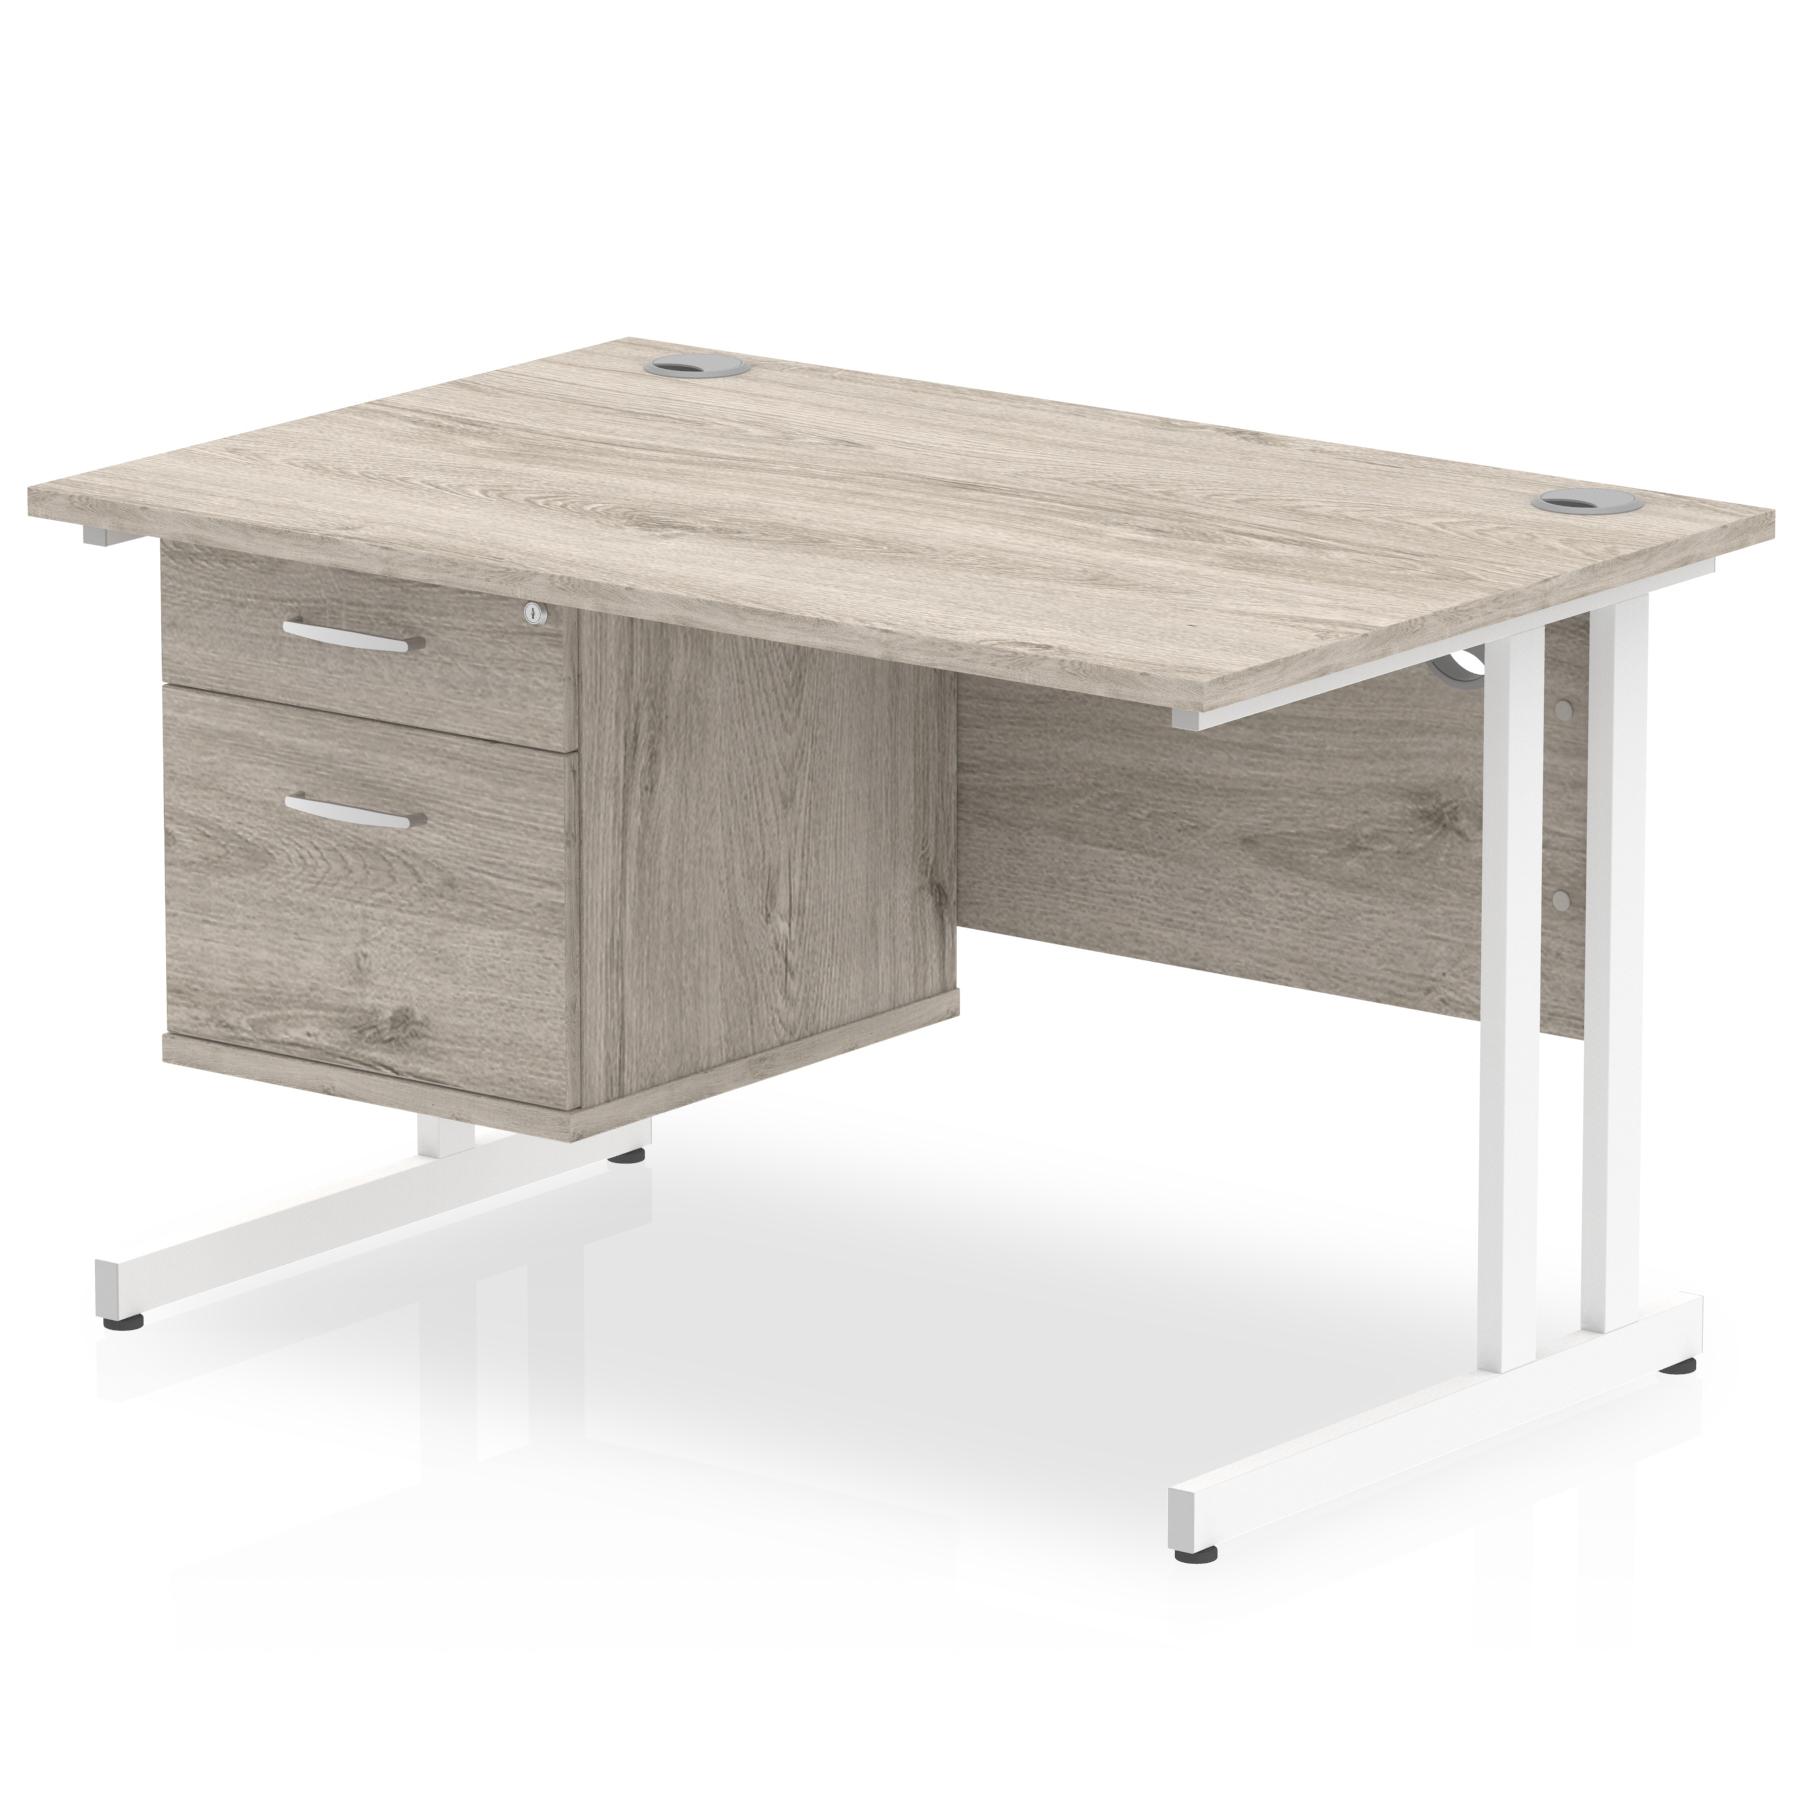 Trexus Rectangular Desk White Cantilever Leg 1200x800mm Fixed Ped 2 Drawers Grey Oak Ref I003446